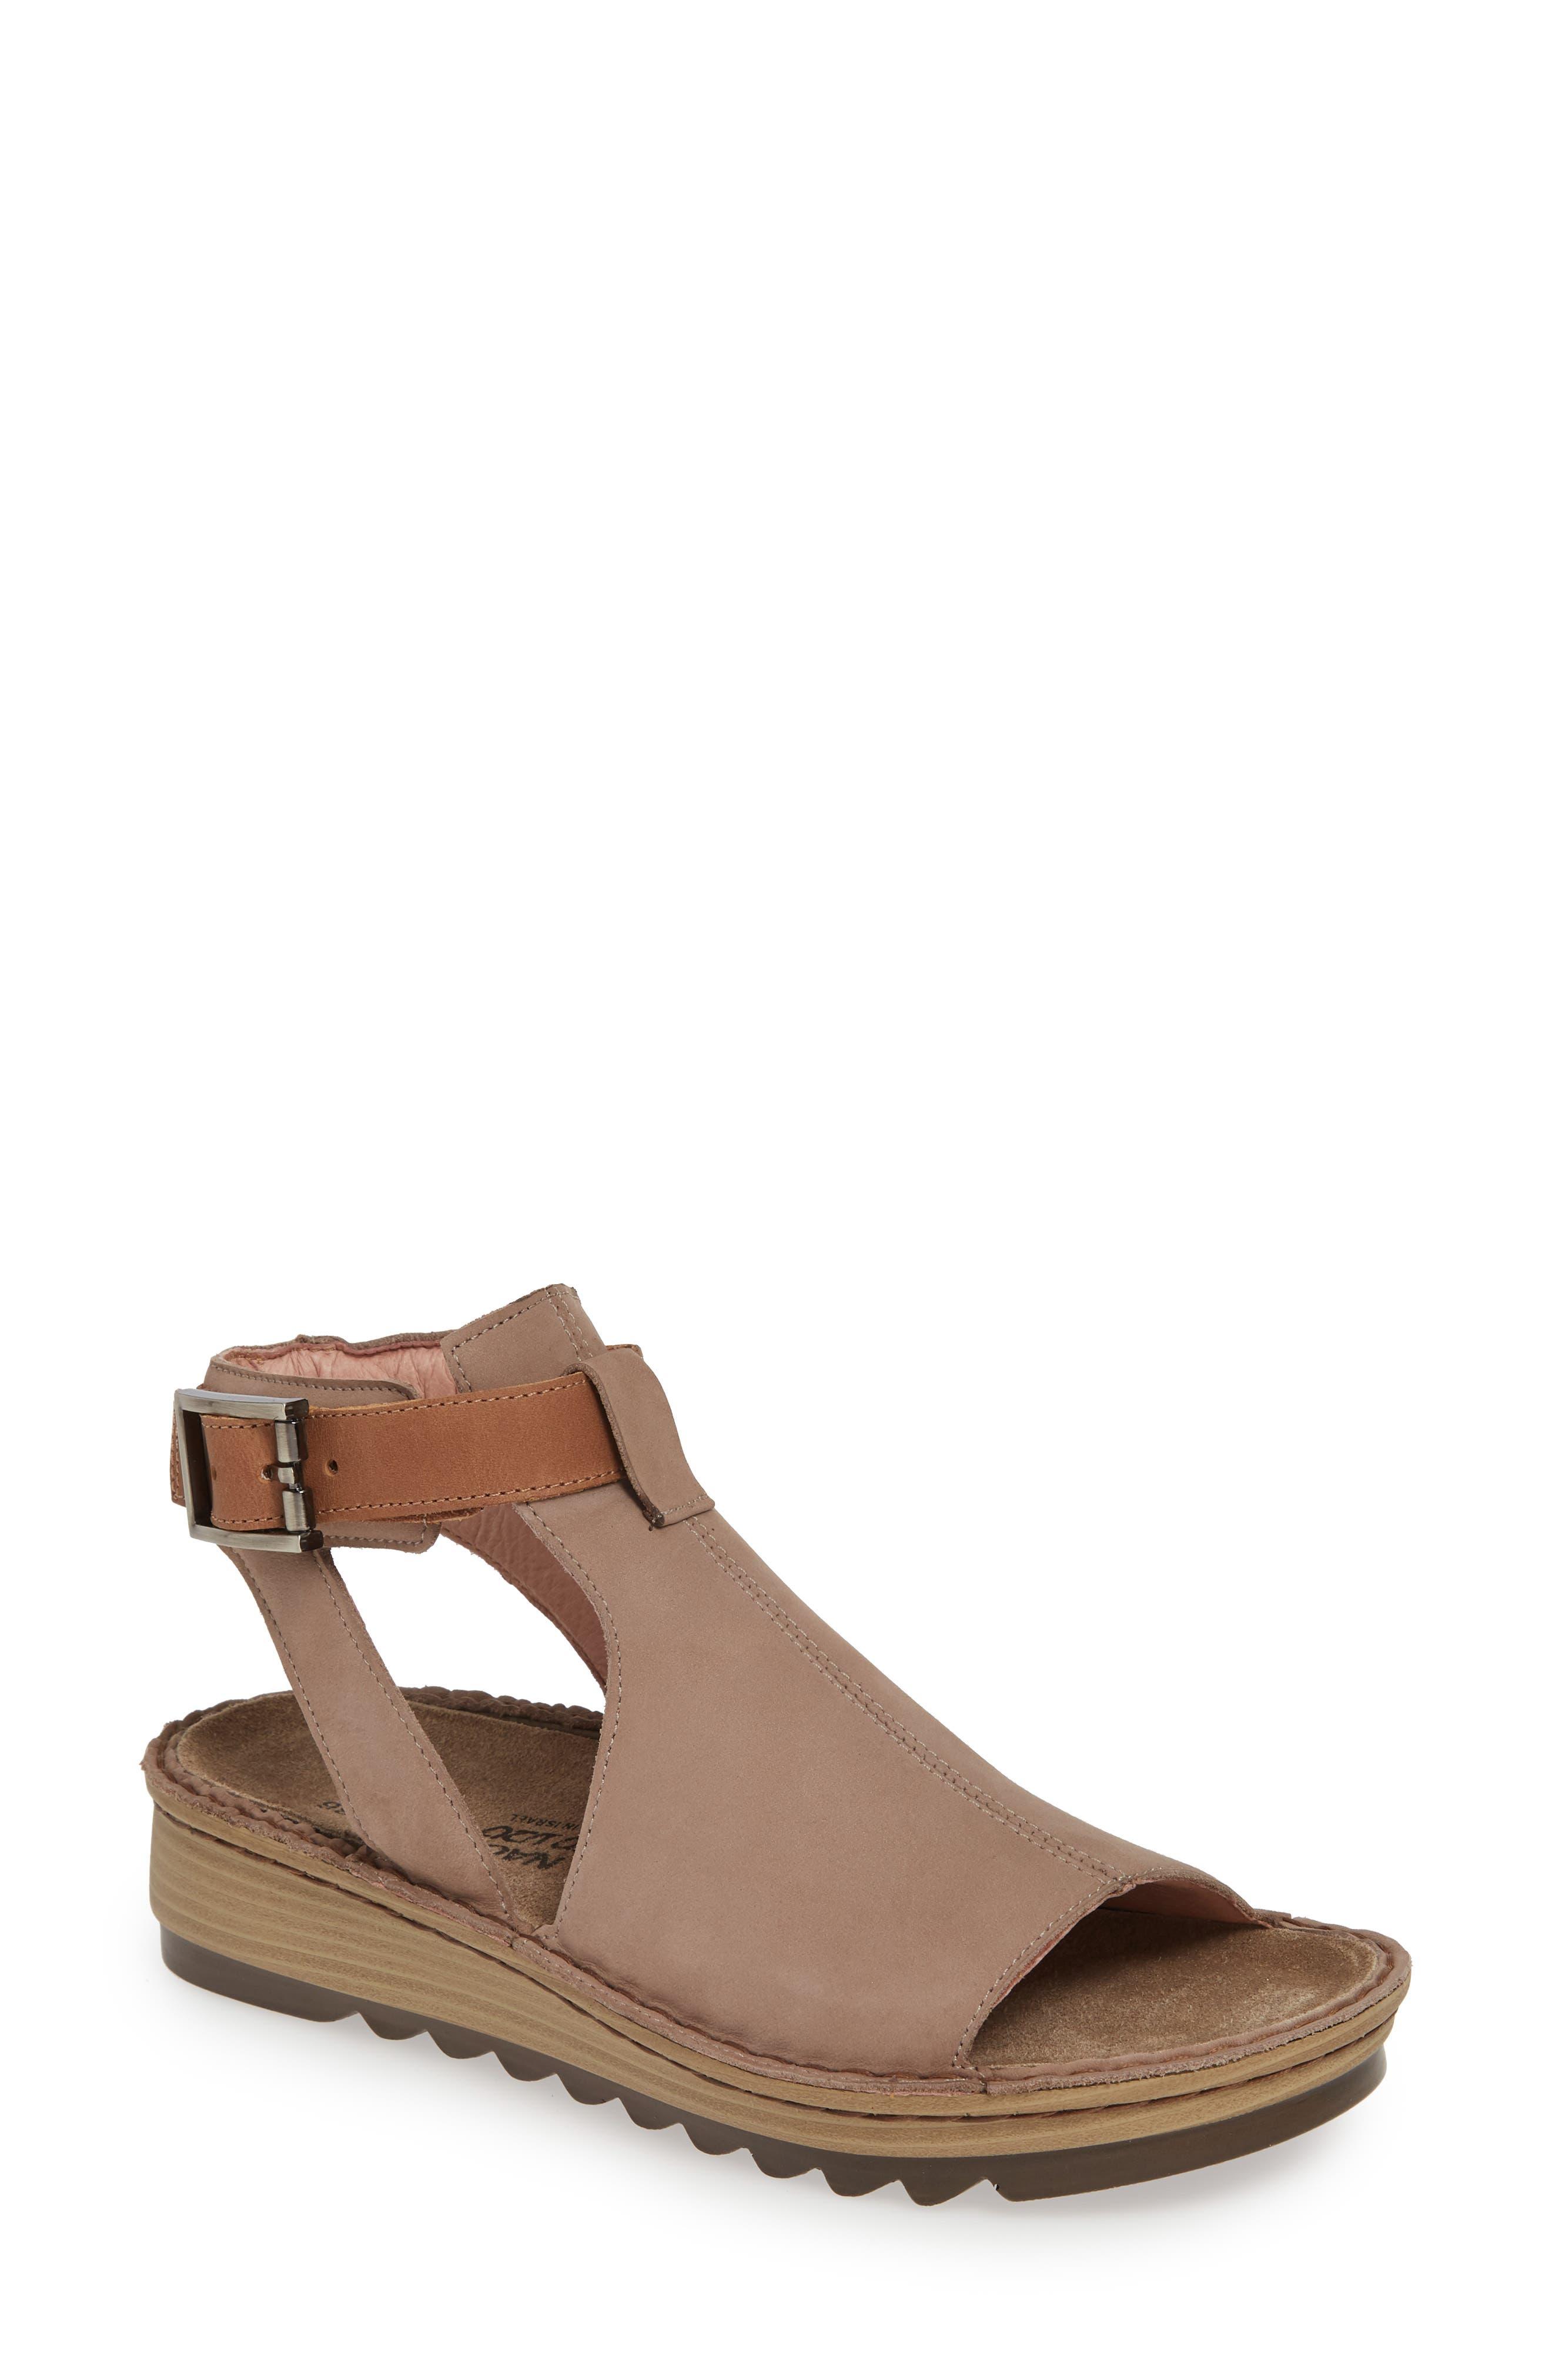 NAOT Verbena Sandal, Main, color, STONE/ LATTE NUBUCK LEATHER